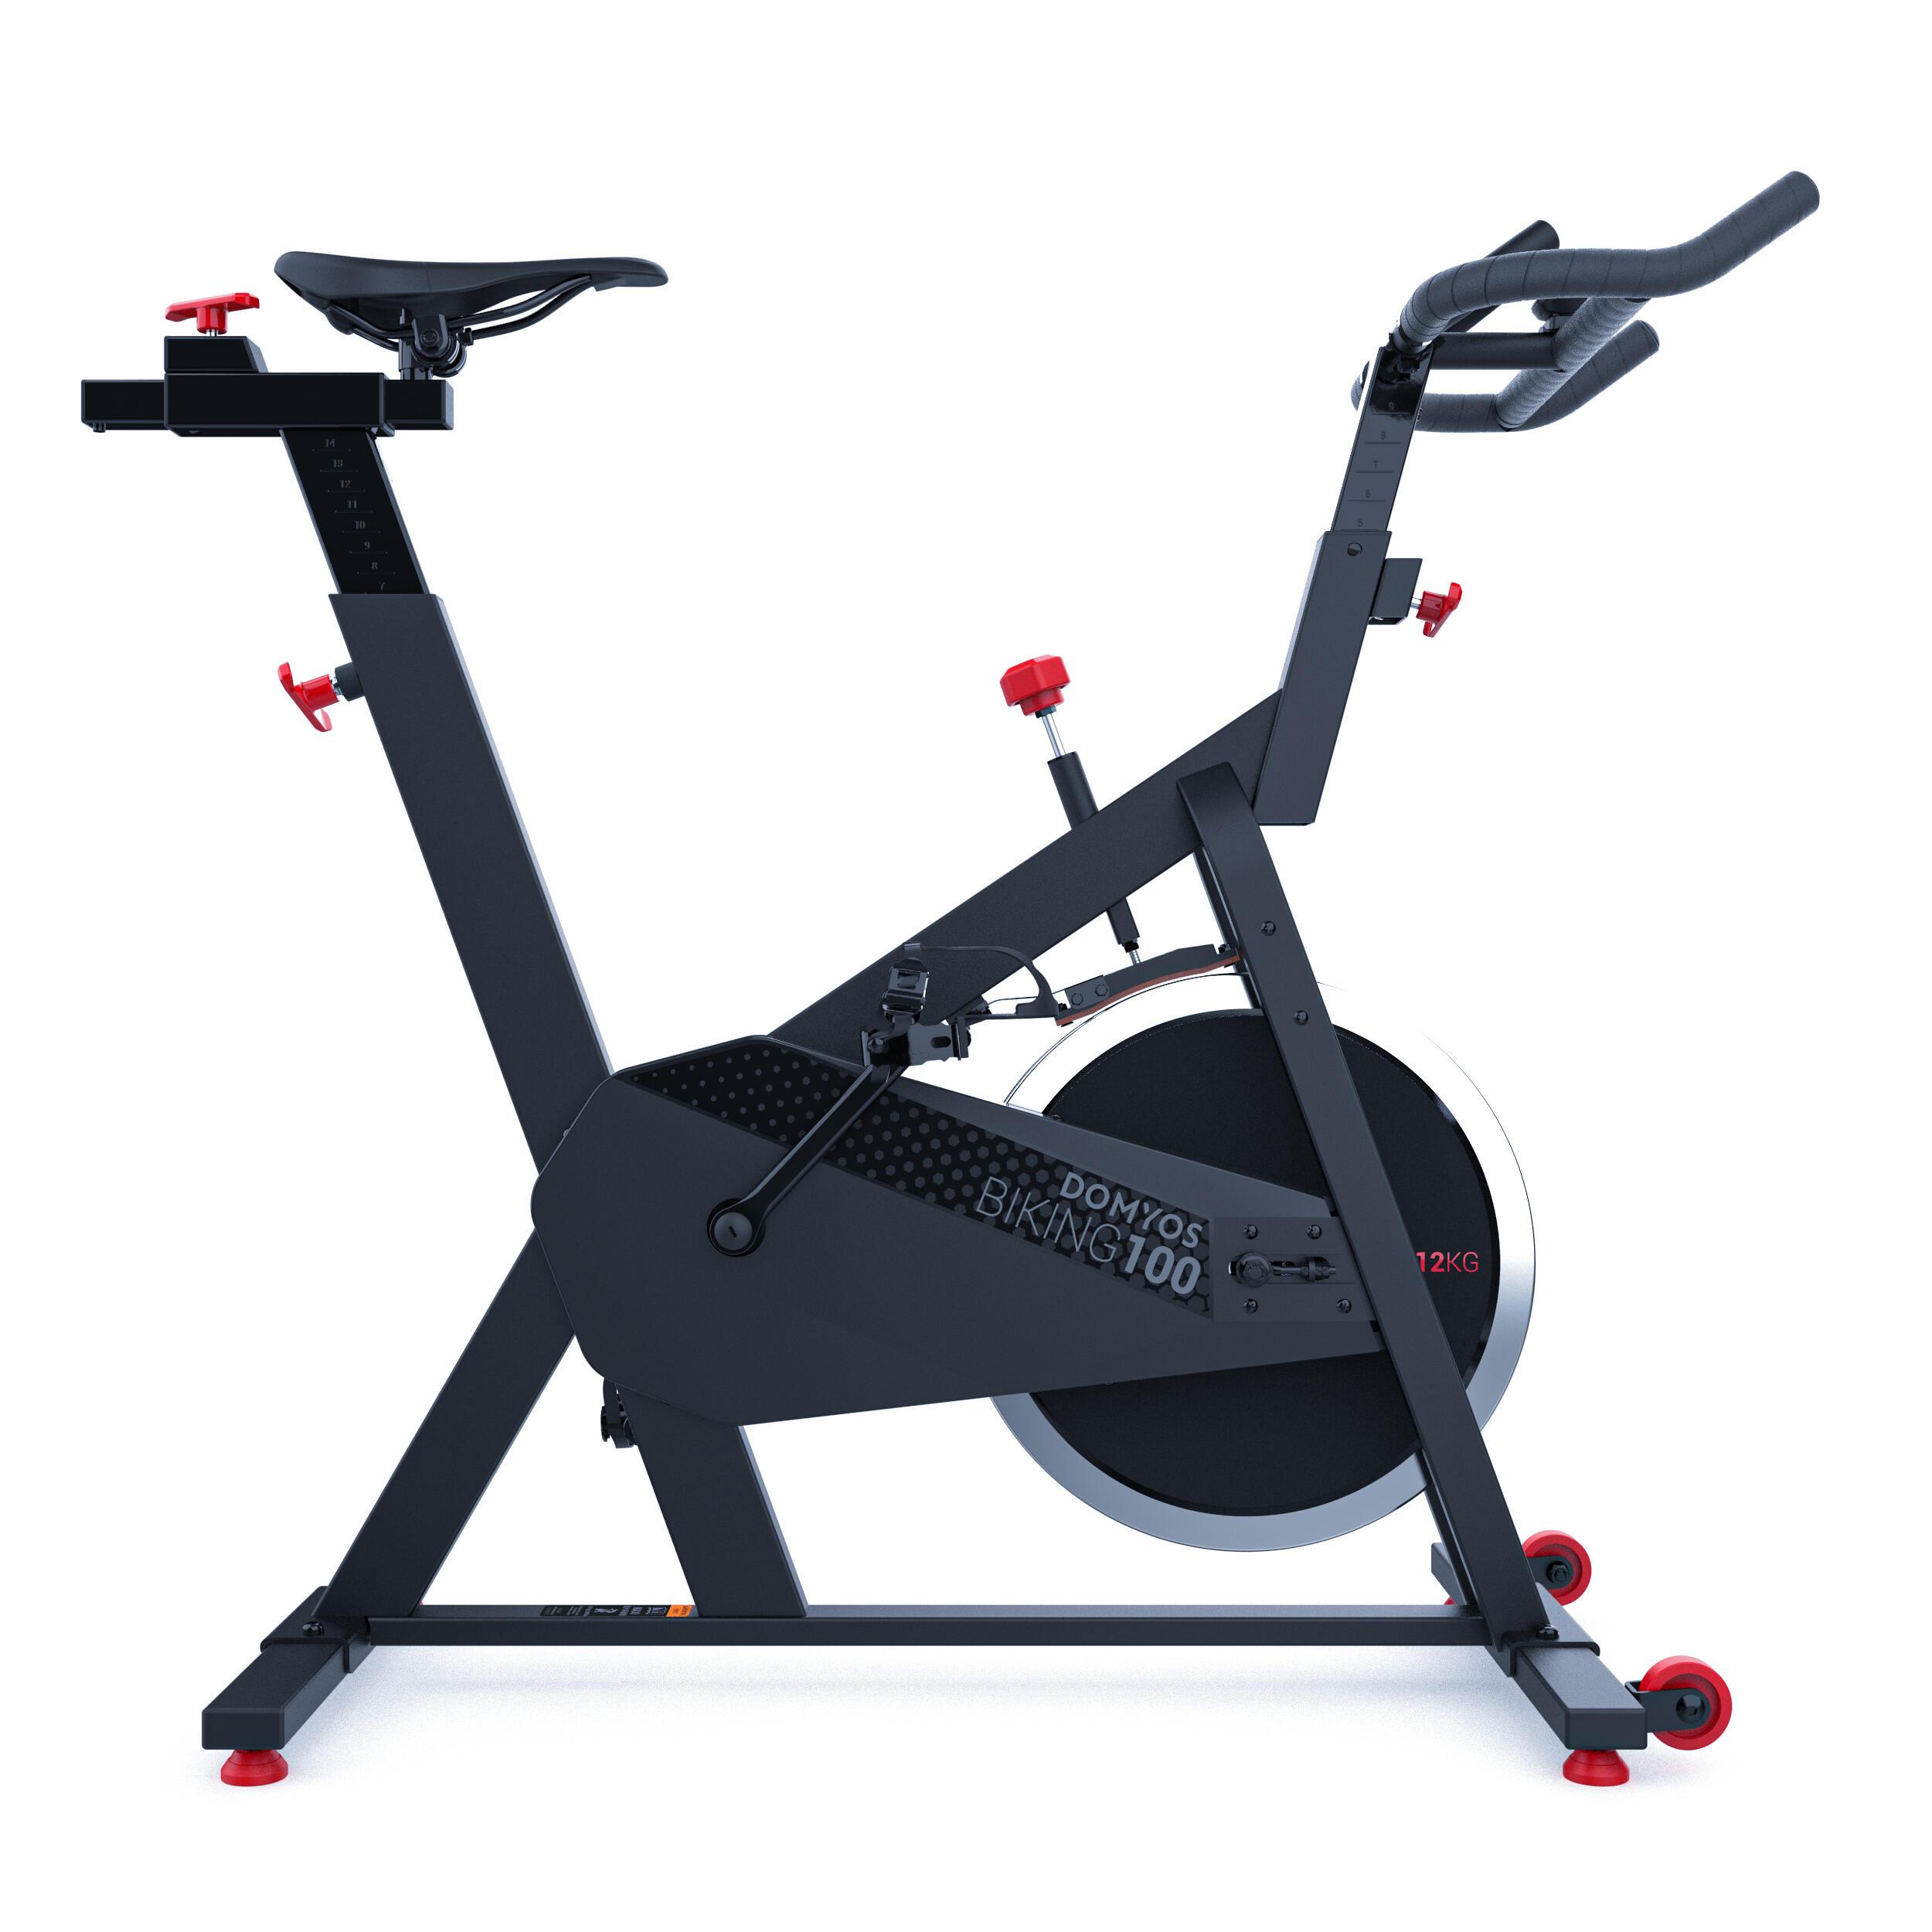 Comprar Bicicletas De Spinning Online Decathlon